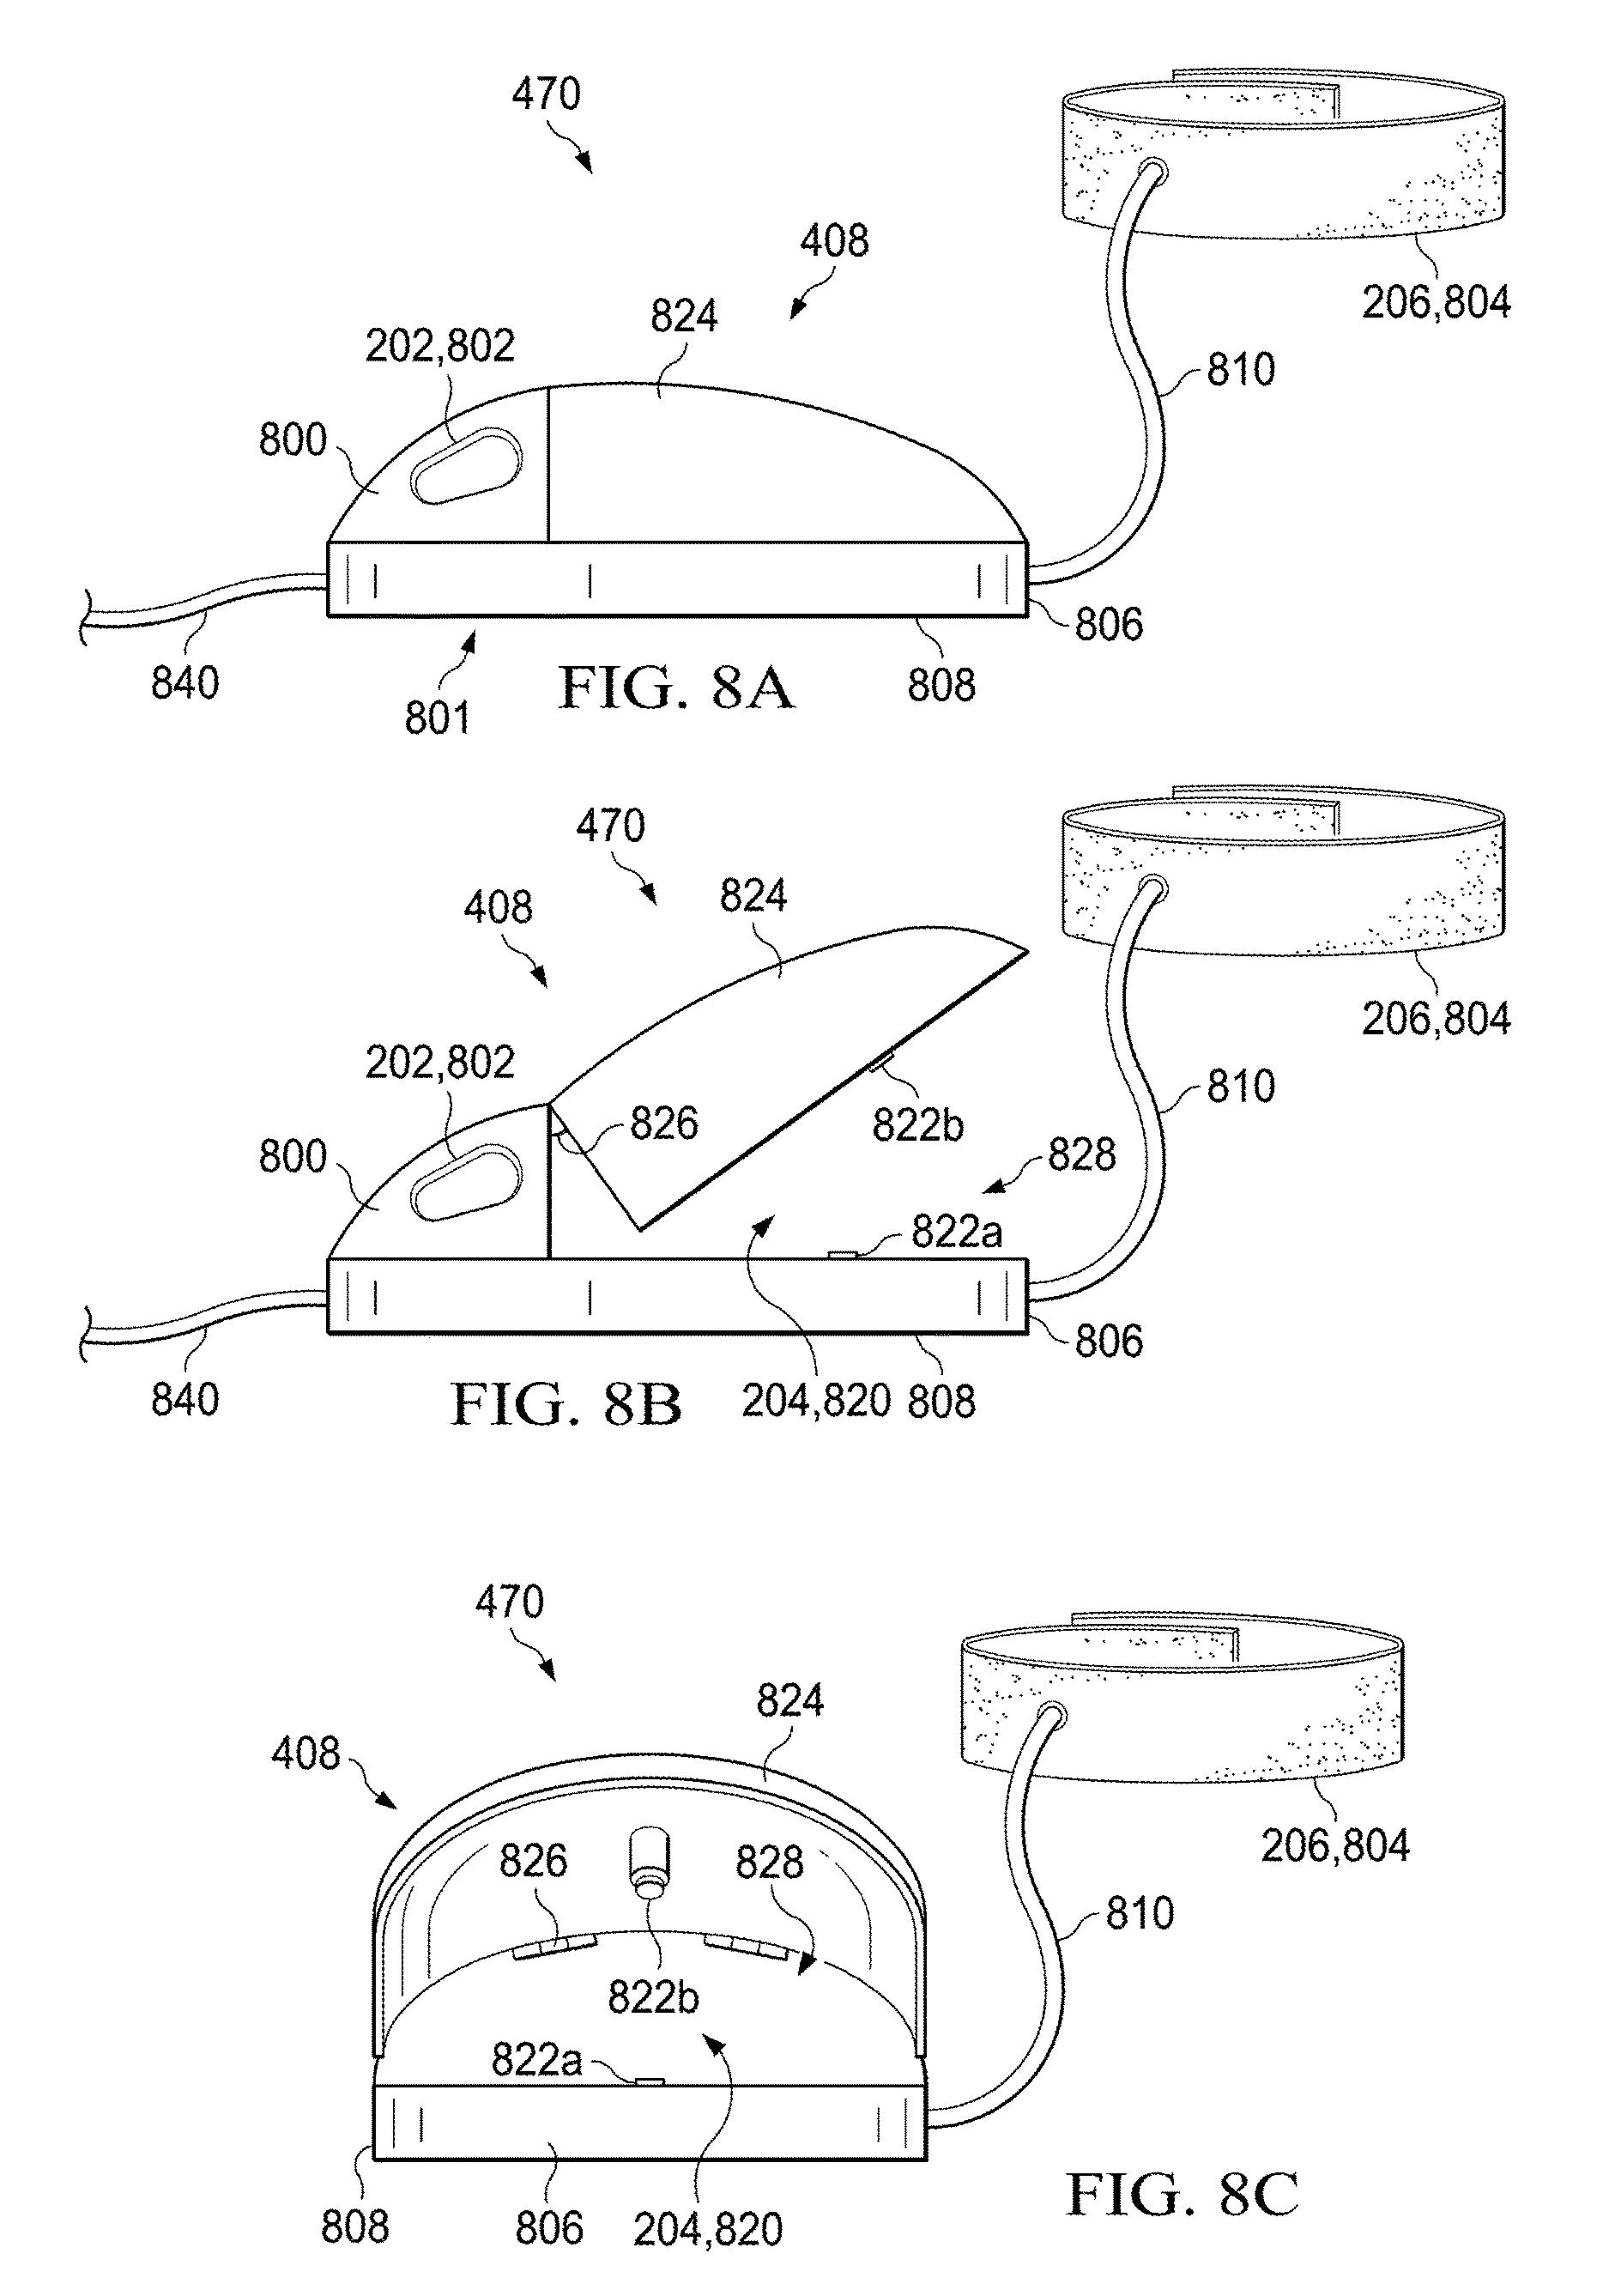 patent us 9 693 734 b2 Labeled Diagram patent